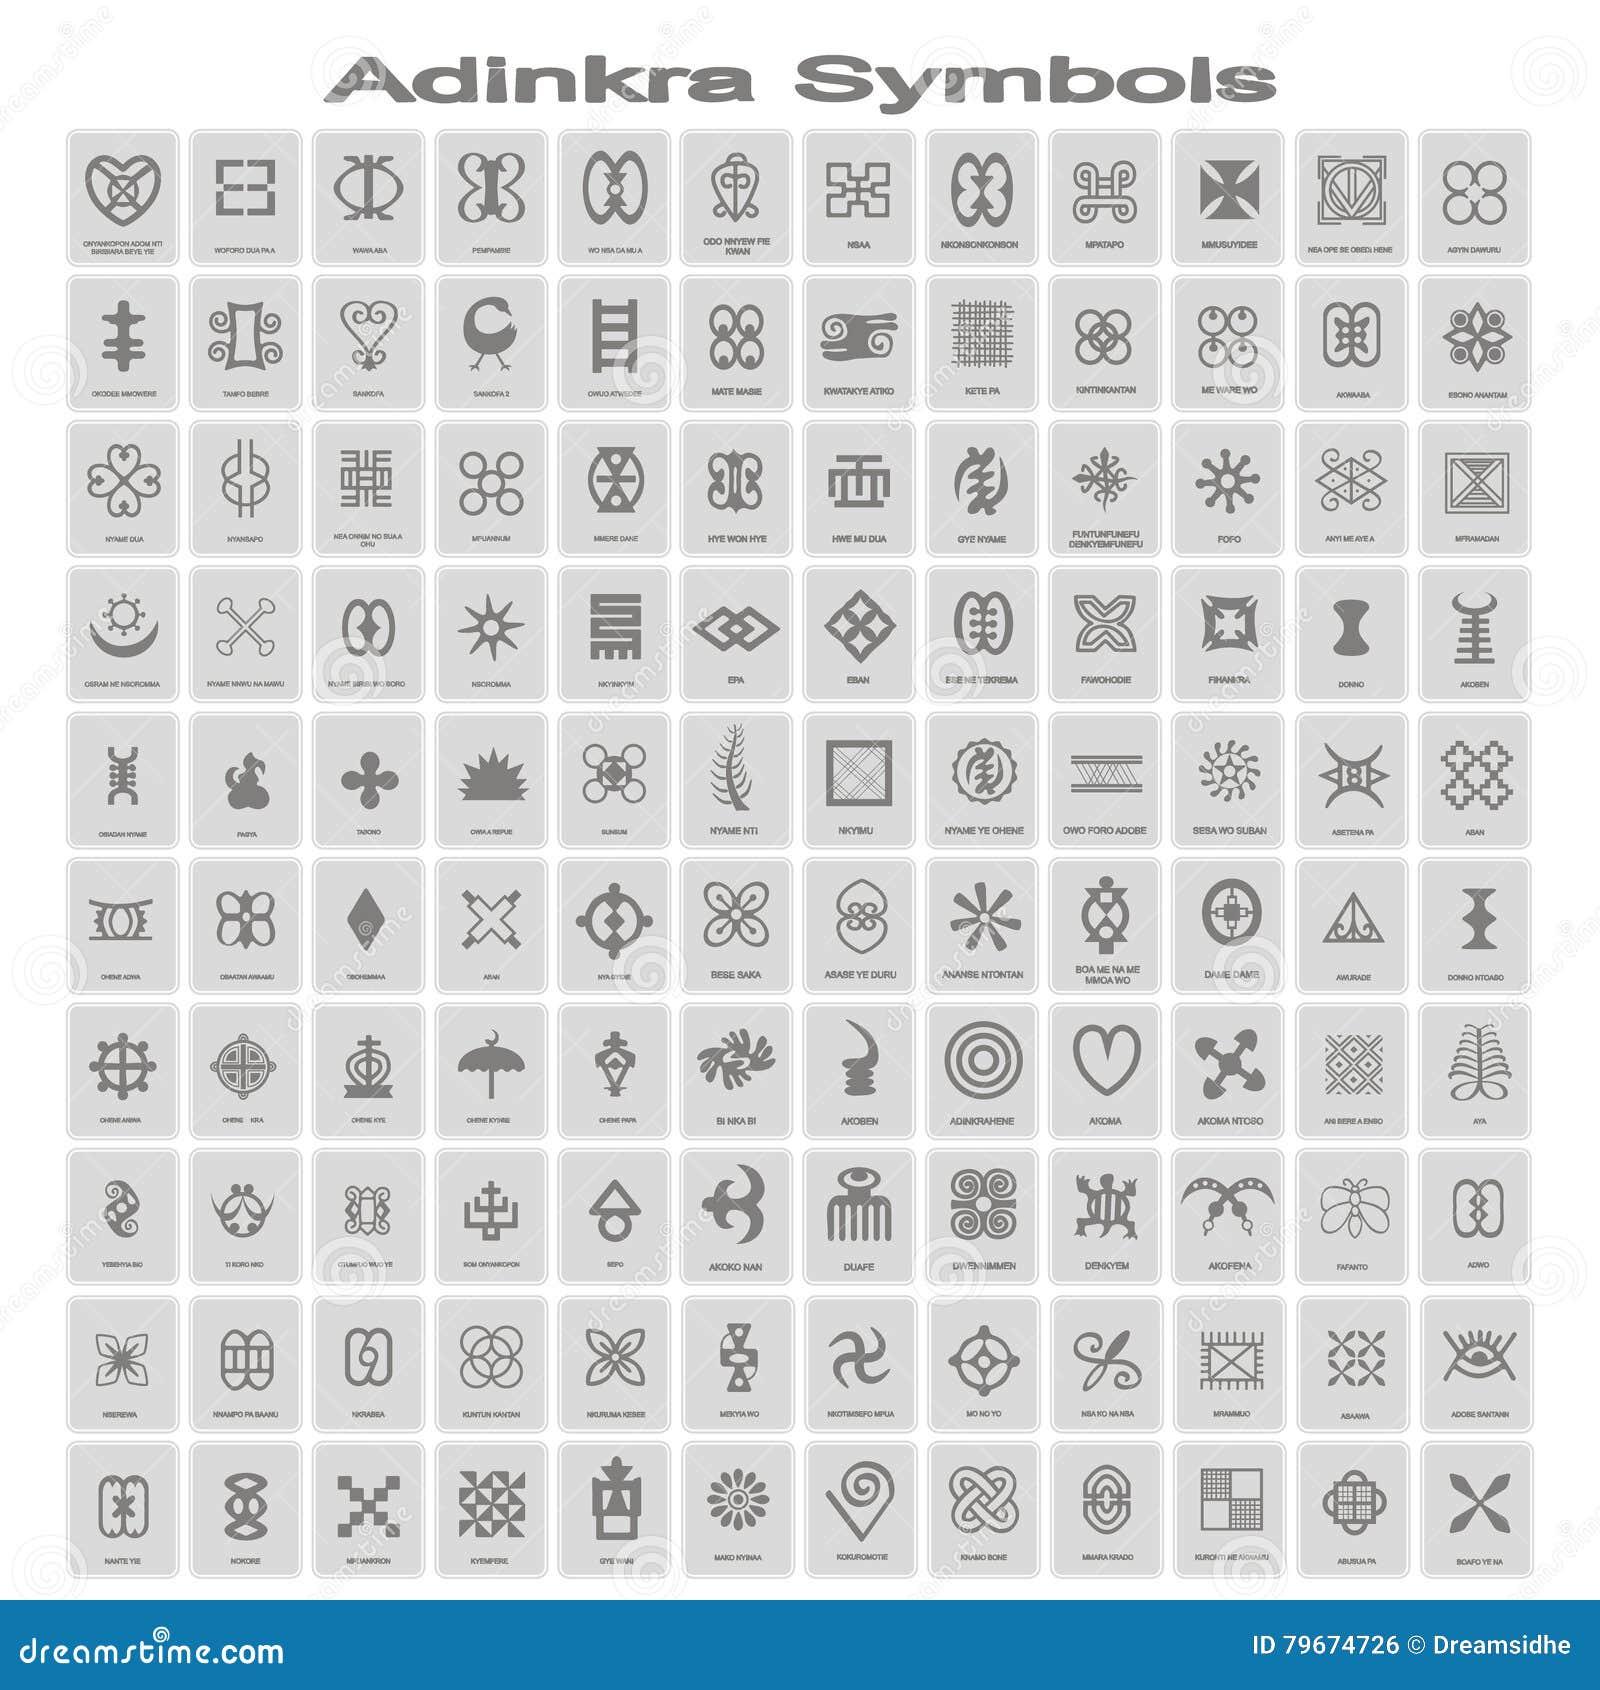 Download Set Of Monochrome Icons With Adinkra Symbols Stock Vector - Illustration of icon, adinkra: 79674726